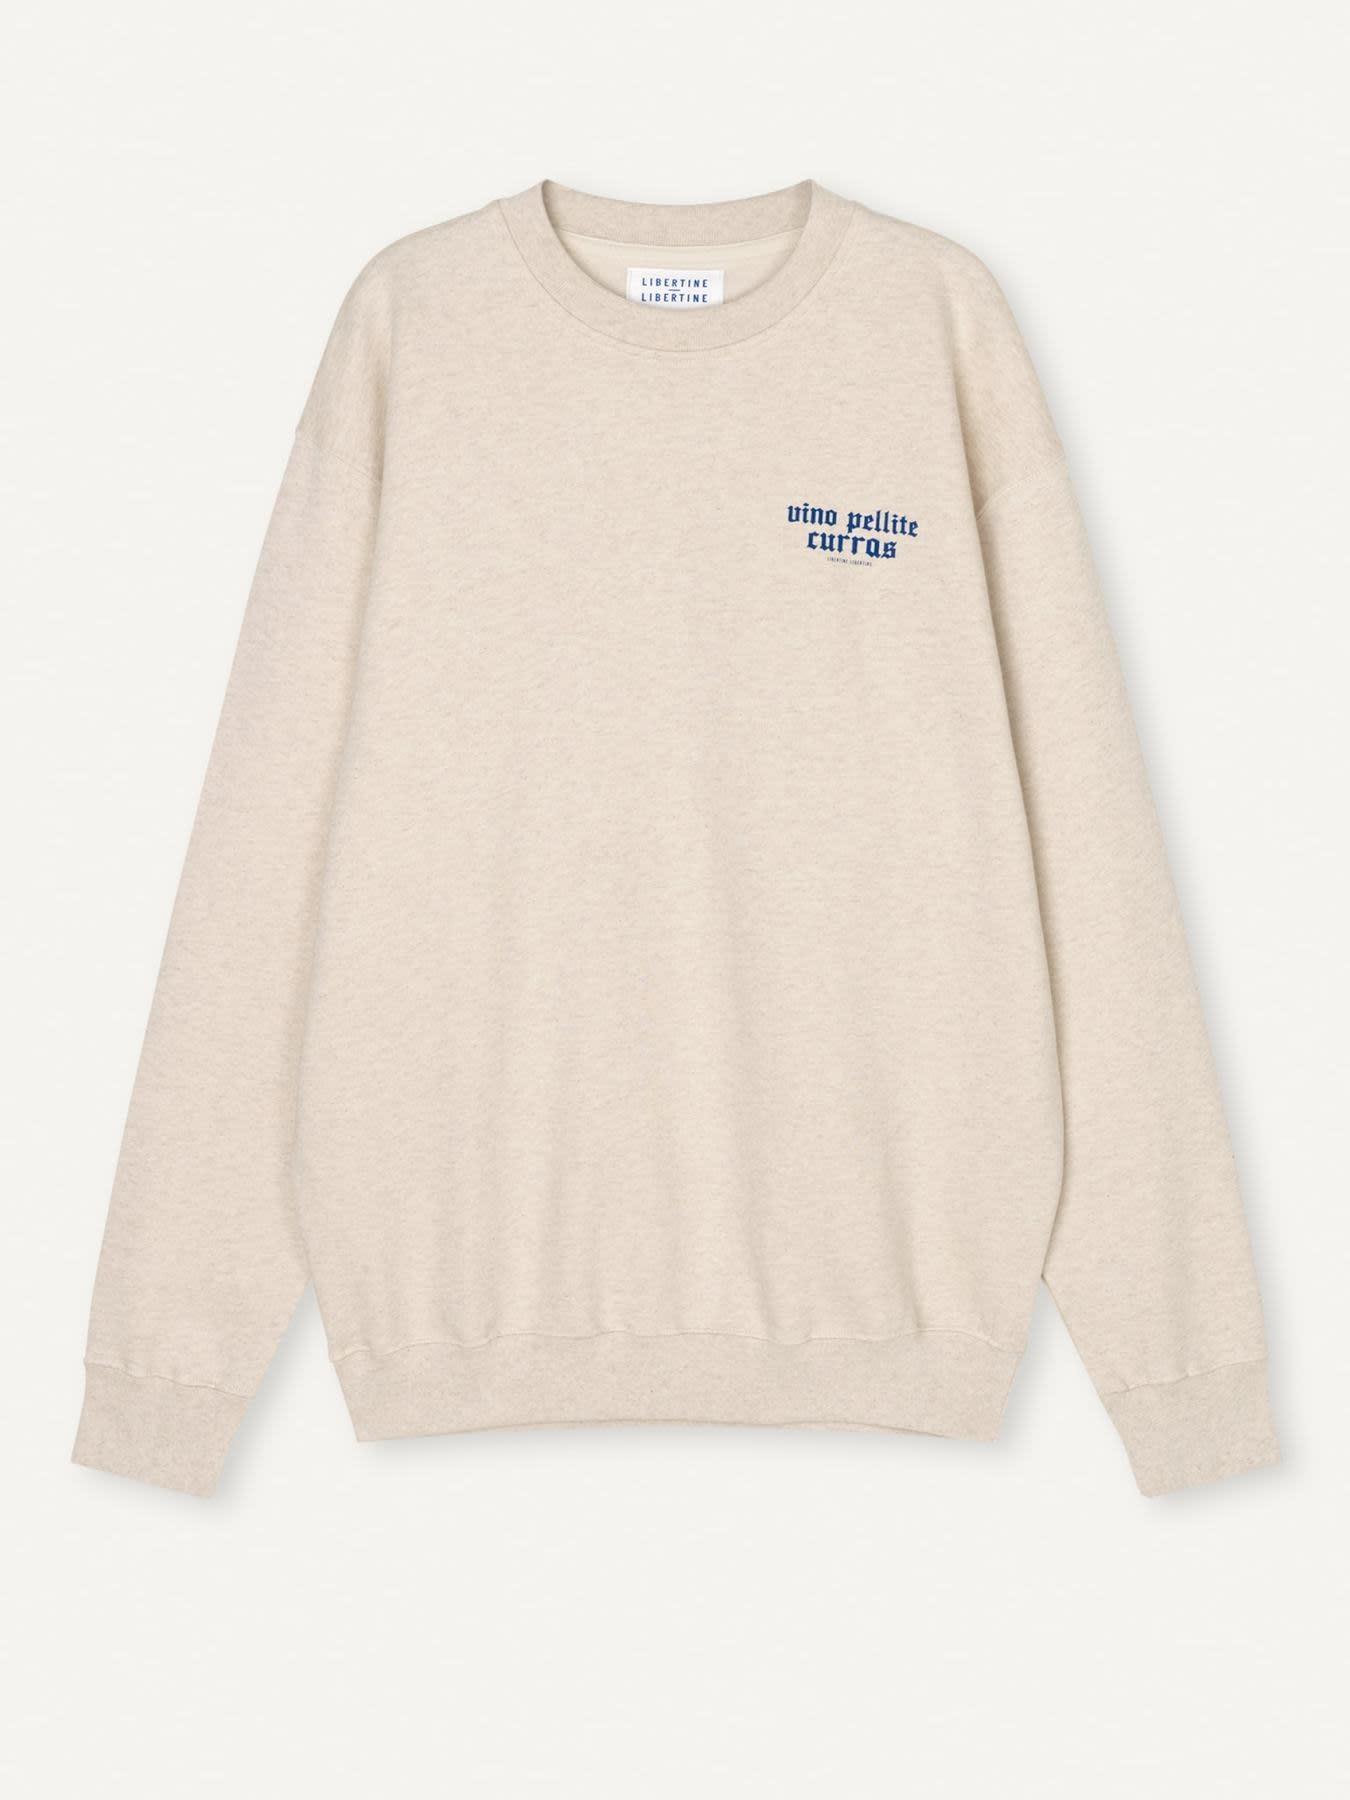 Society Pellite Sweatshirt Ecru Wit-1